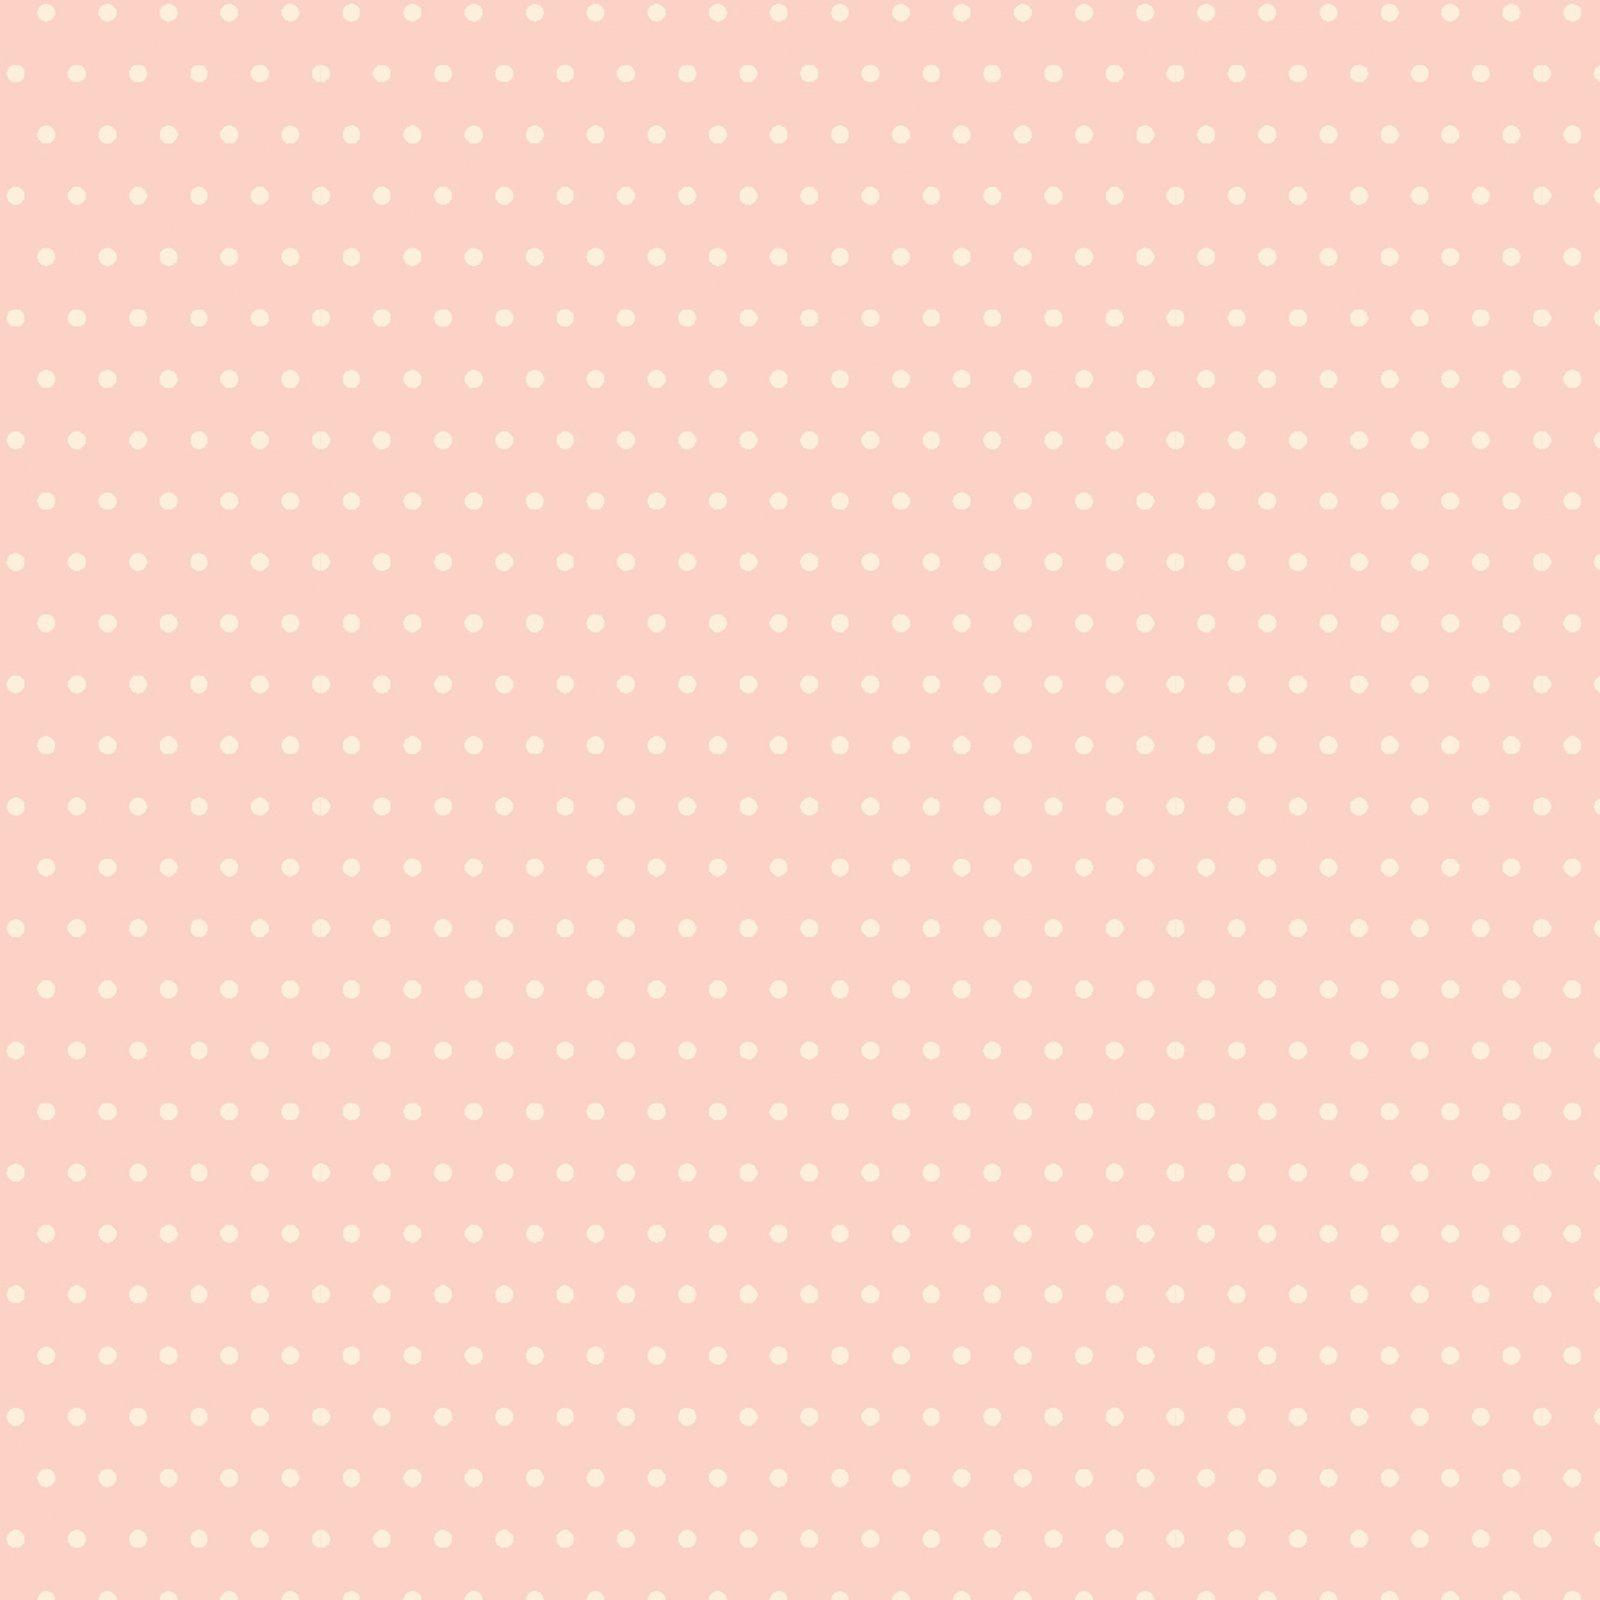 Little Wren Cottage Coordinate - Pink Dots